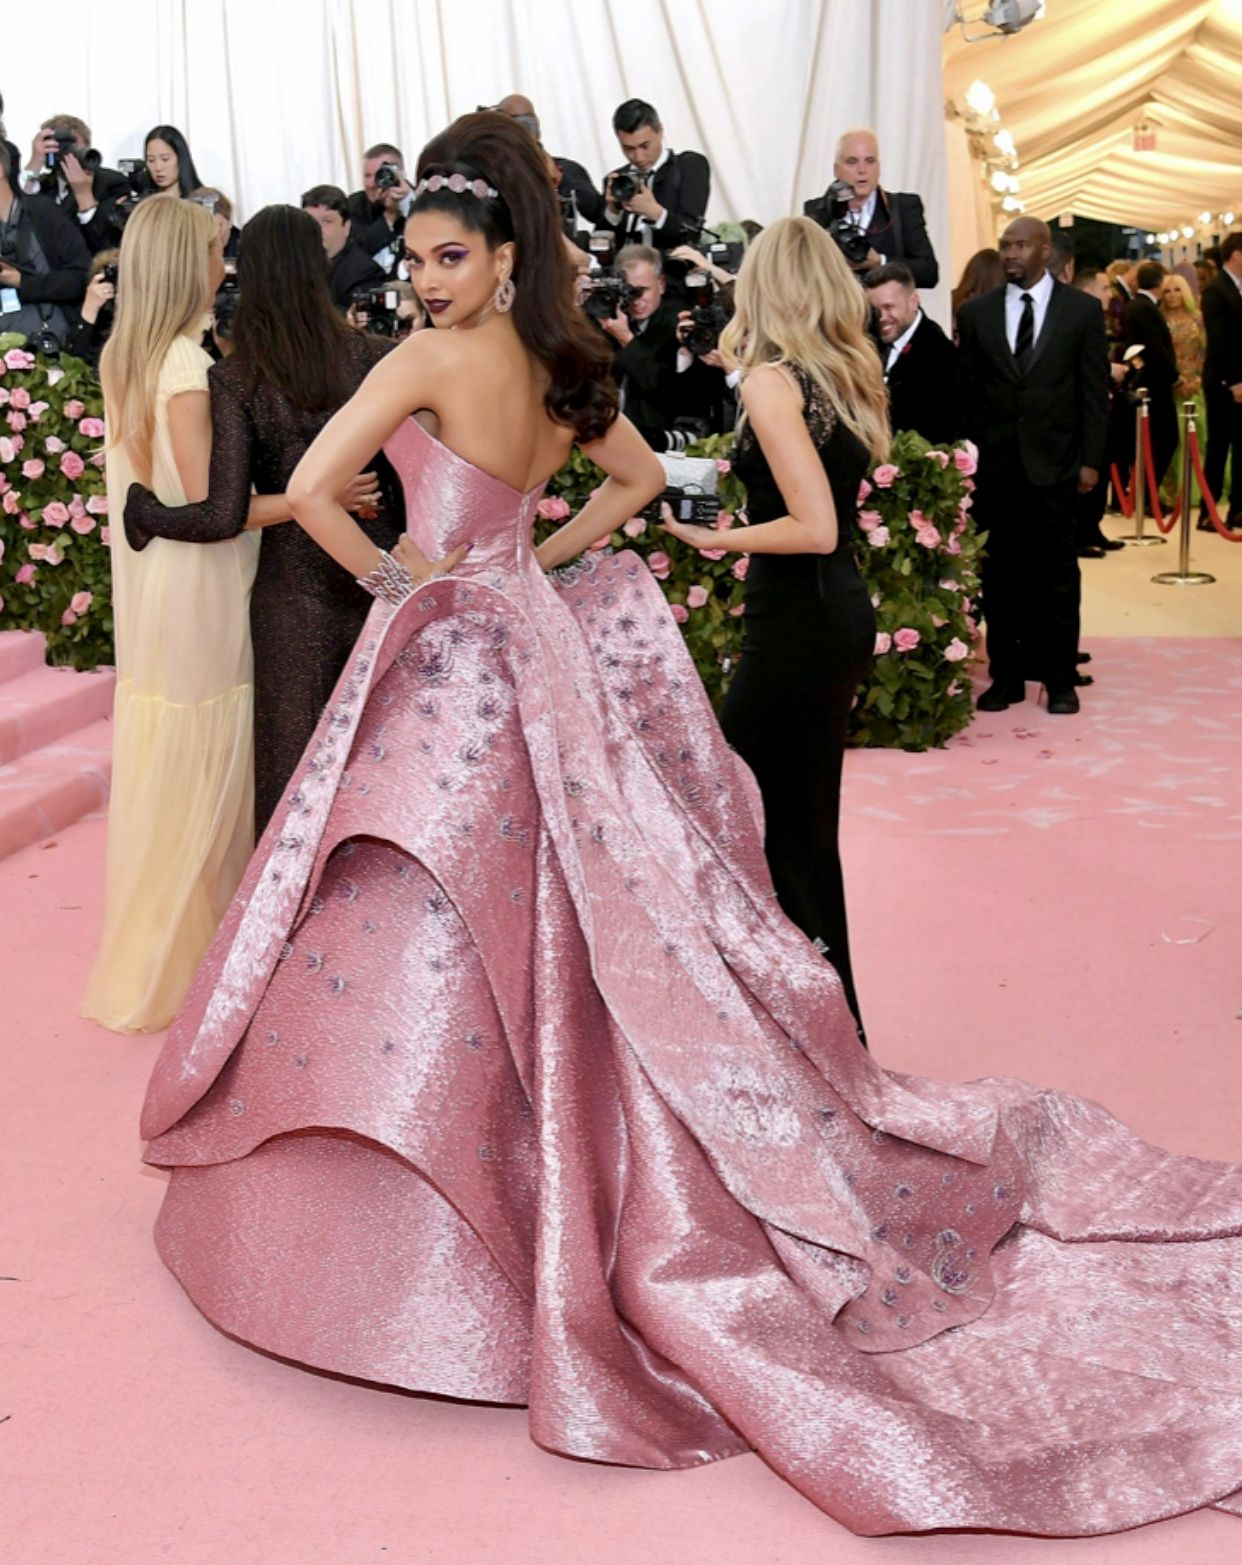 Deepika Padukone Met Gala 2019 Designer Zac Posen Barbie Gowns Gowns Pink Gowns